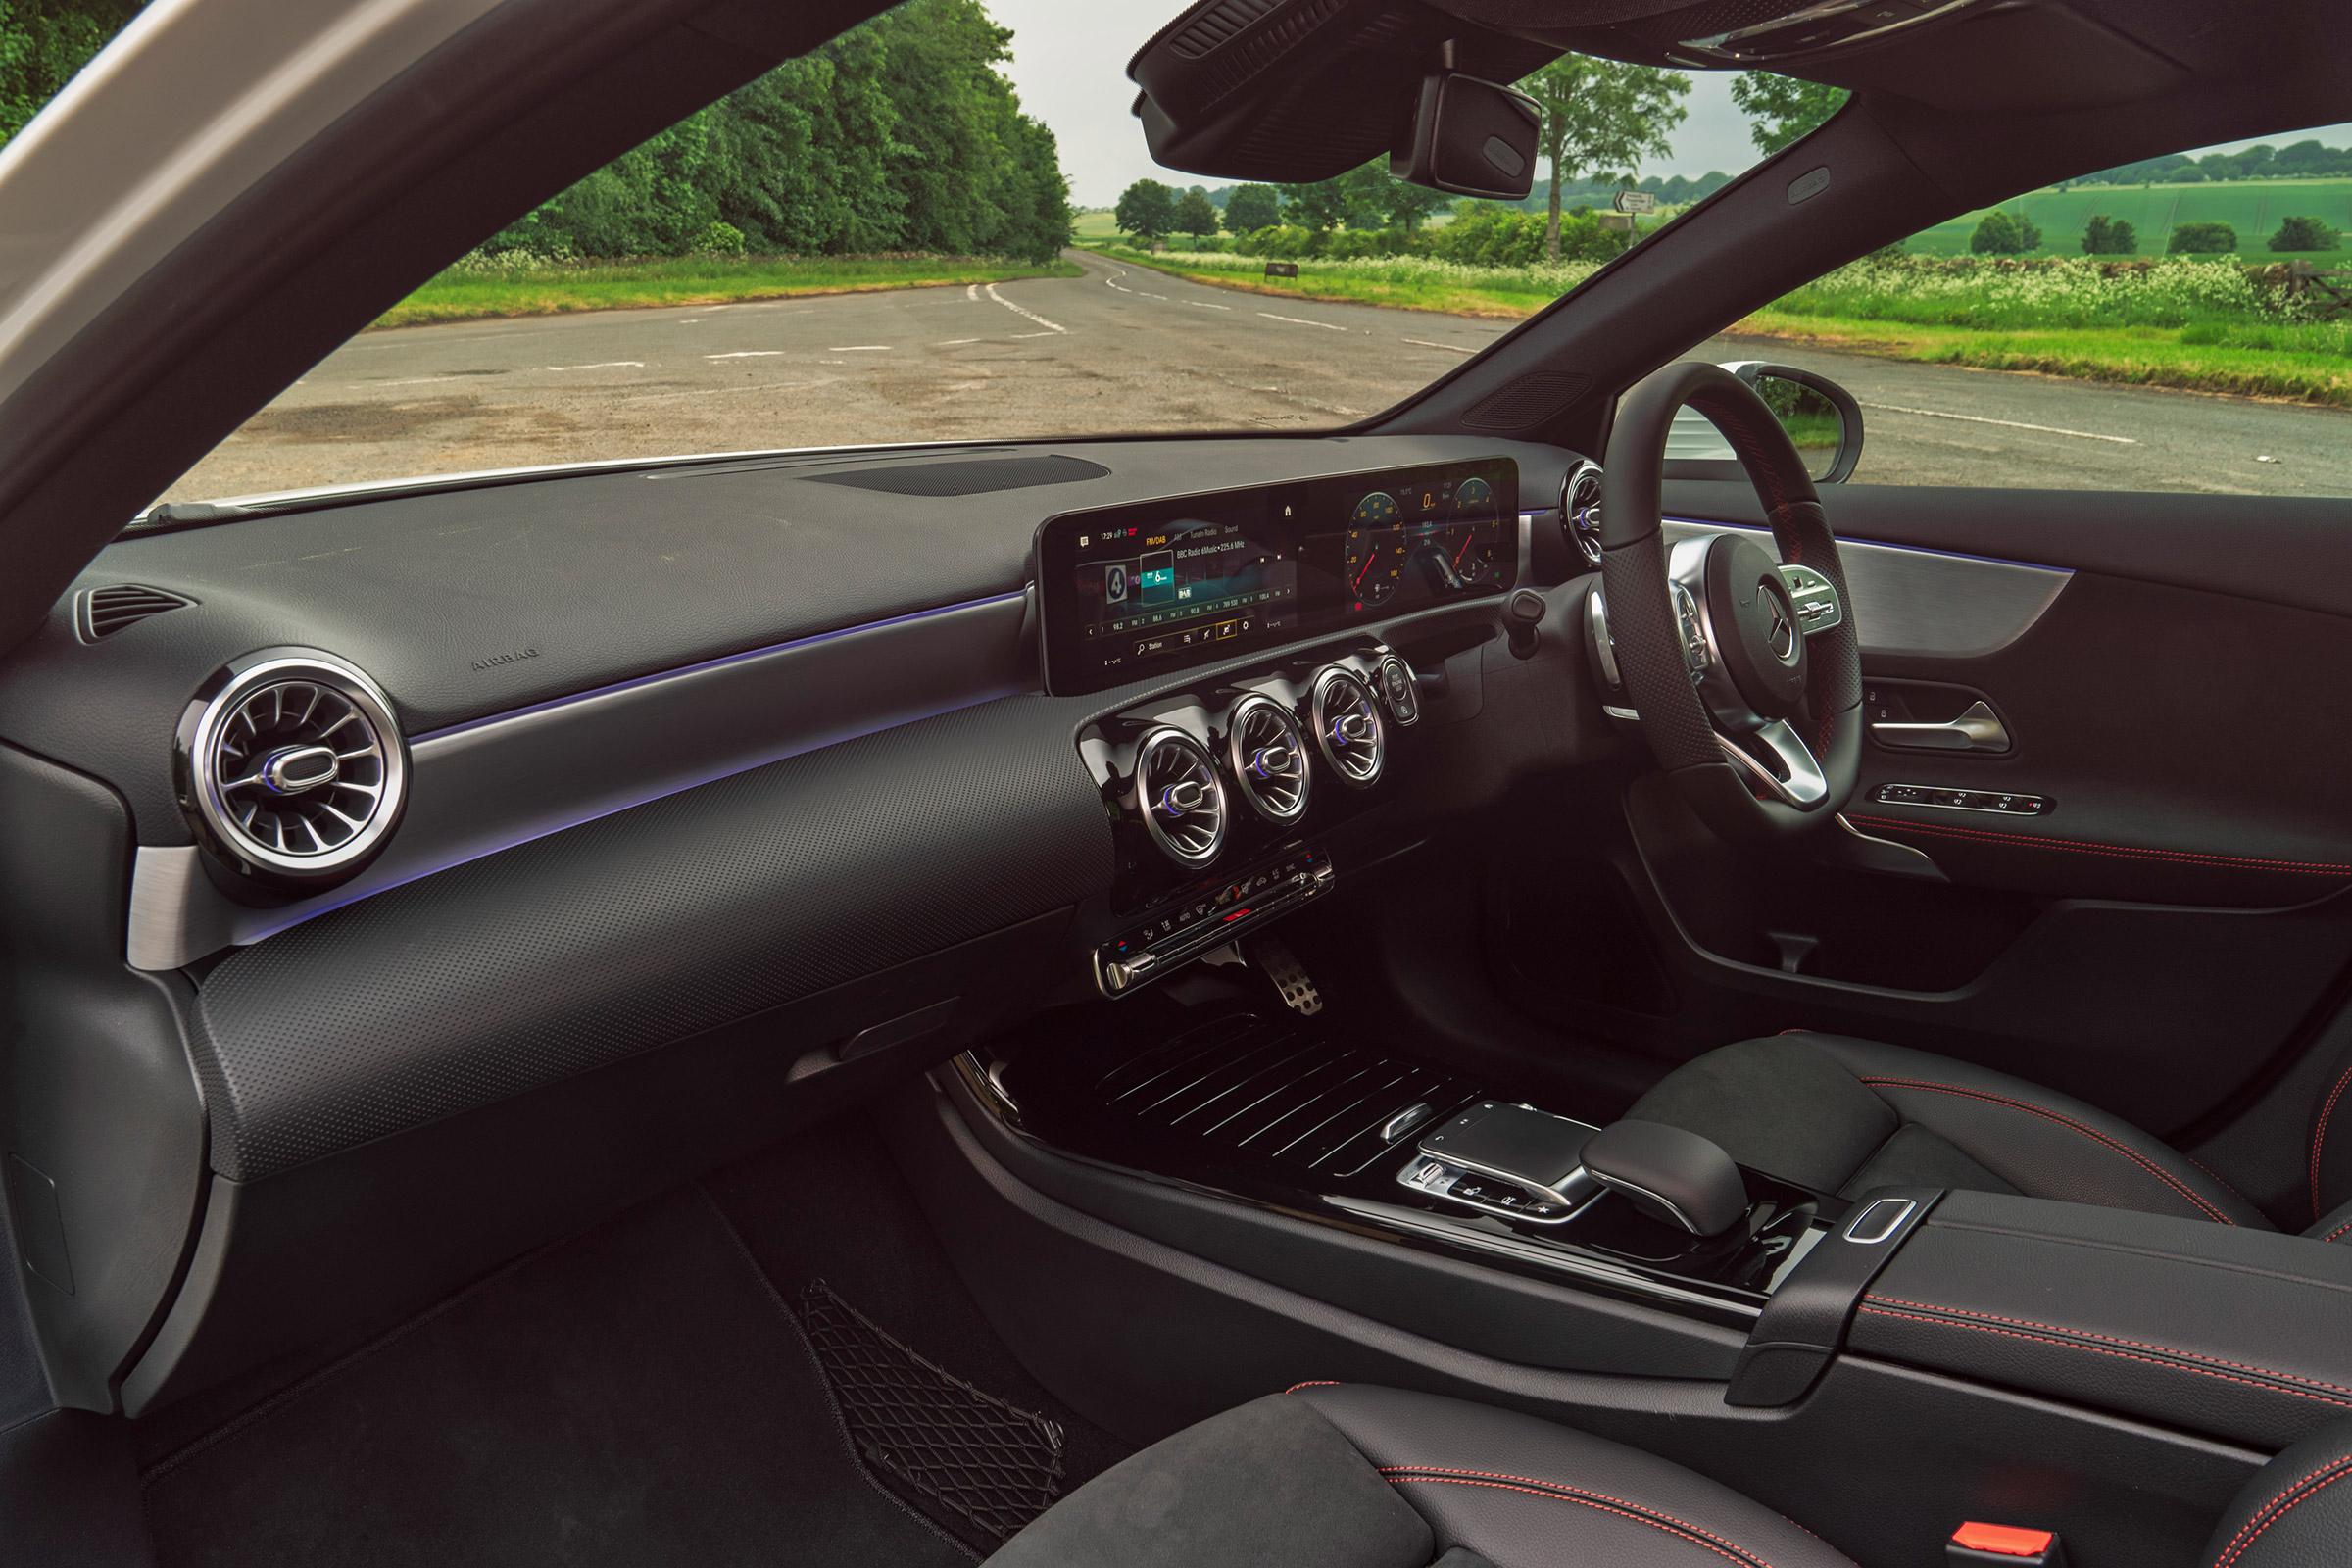 Mercedes-Benz A-class review – high-tech hatch takes aim at